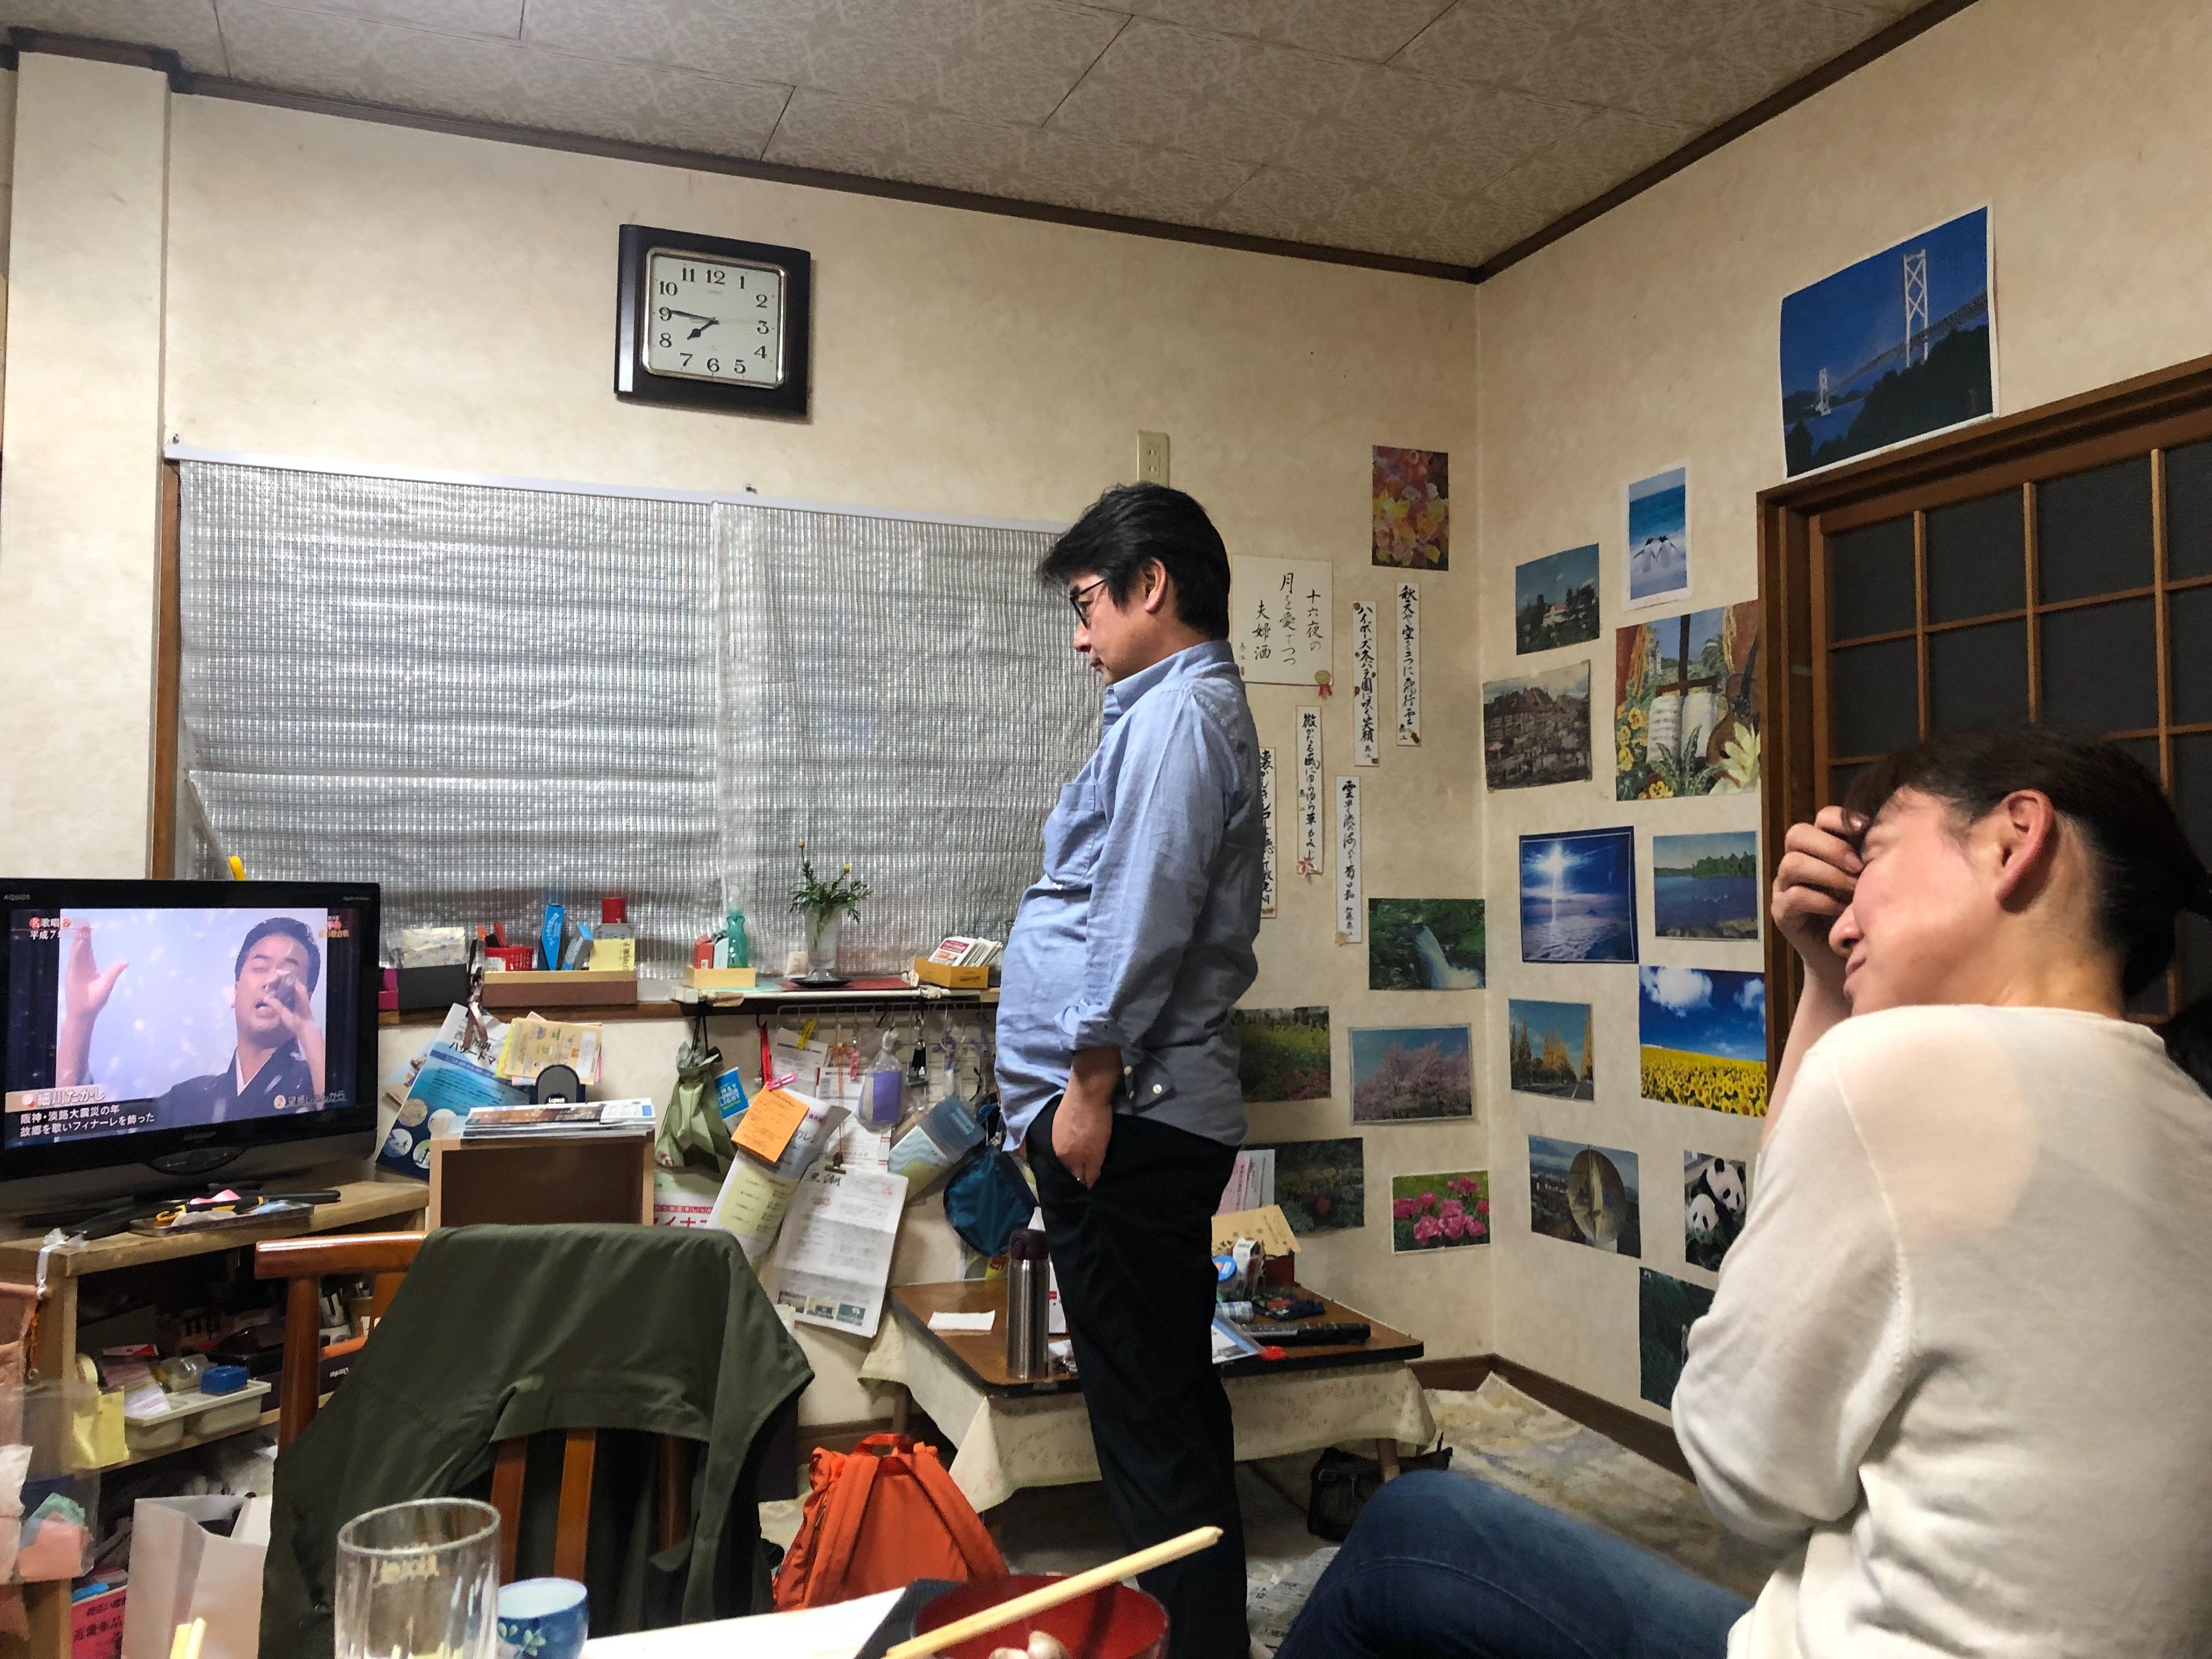 f:id:masanori-kato1972:20190430200056j:image